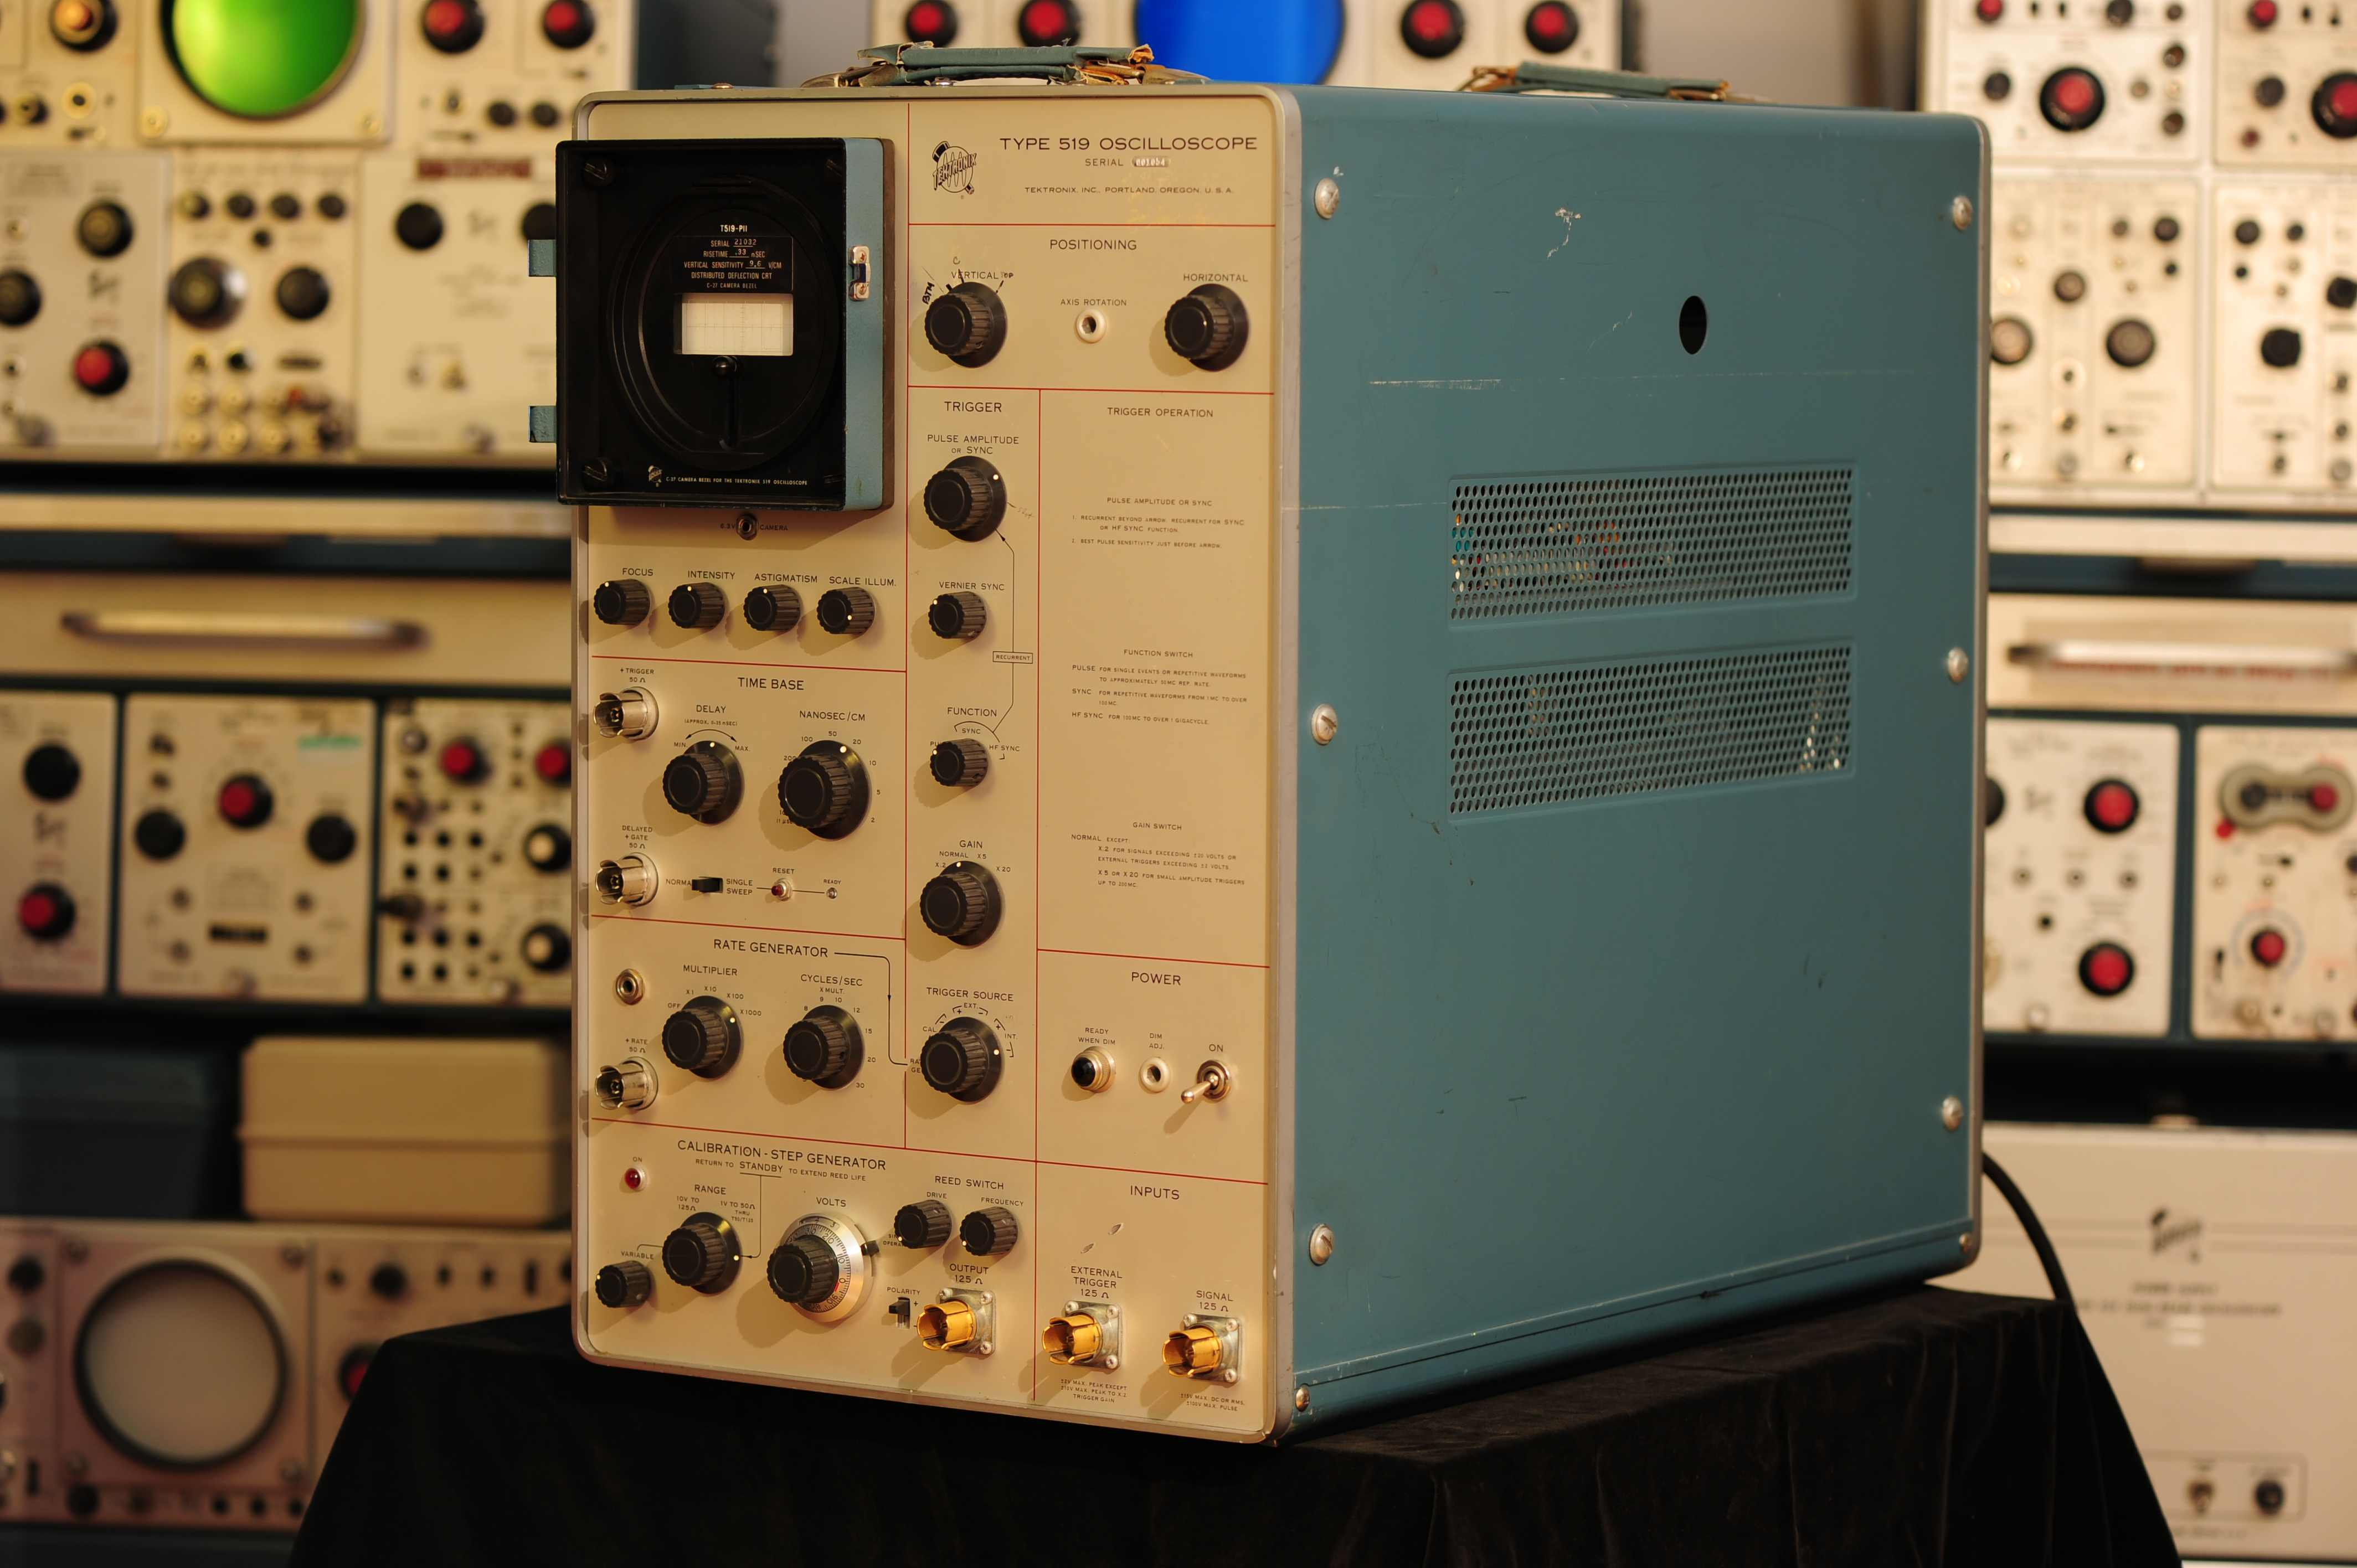 Timothy Koeth The Tek 519 Oscilloscope Control Pannel Twk 6541